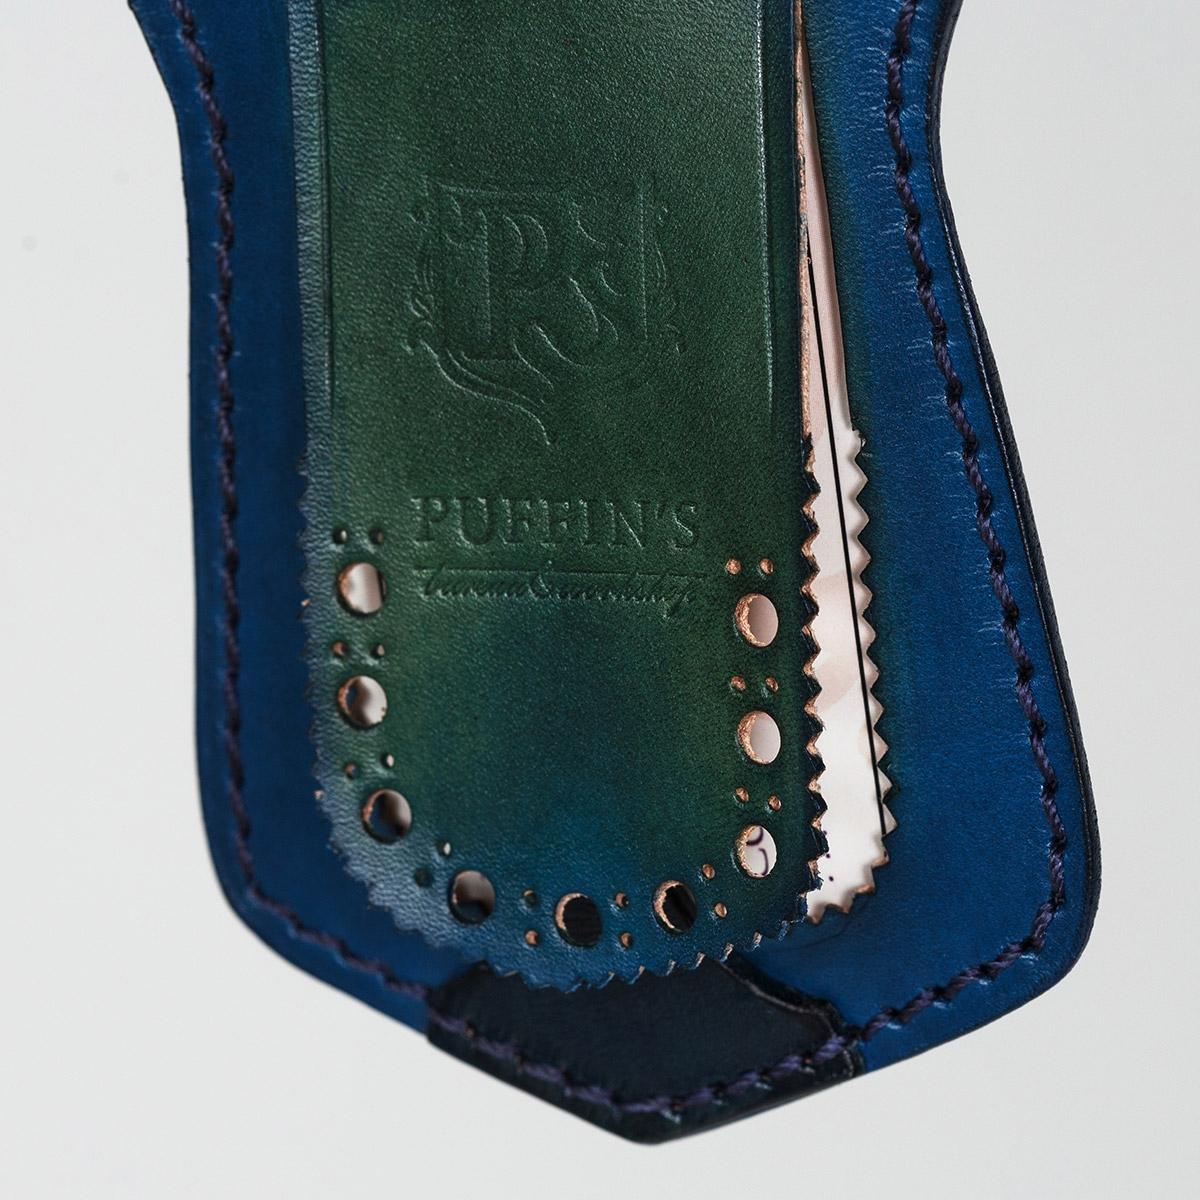 Luggage tag TAVARUA grassy green & sapphire blue